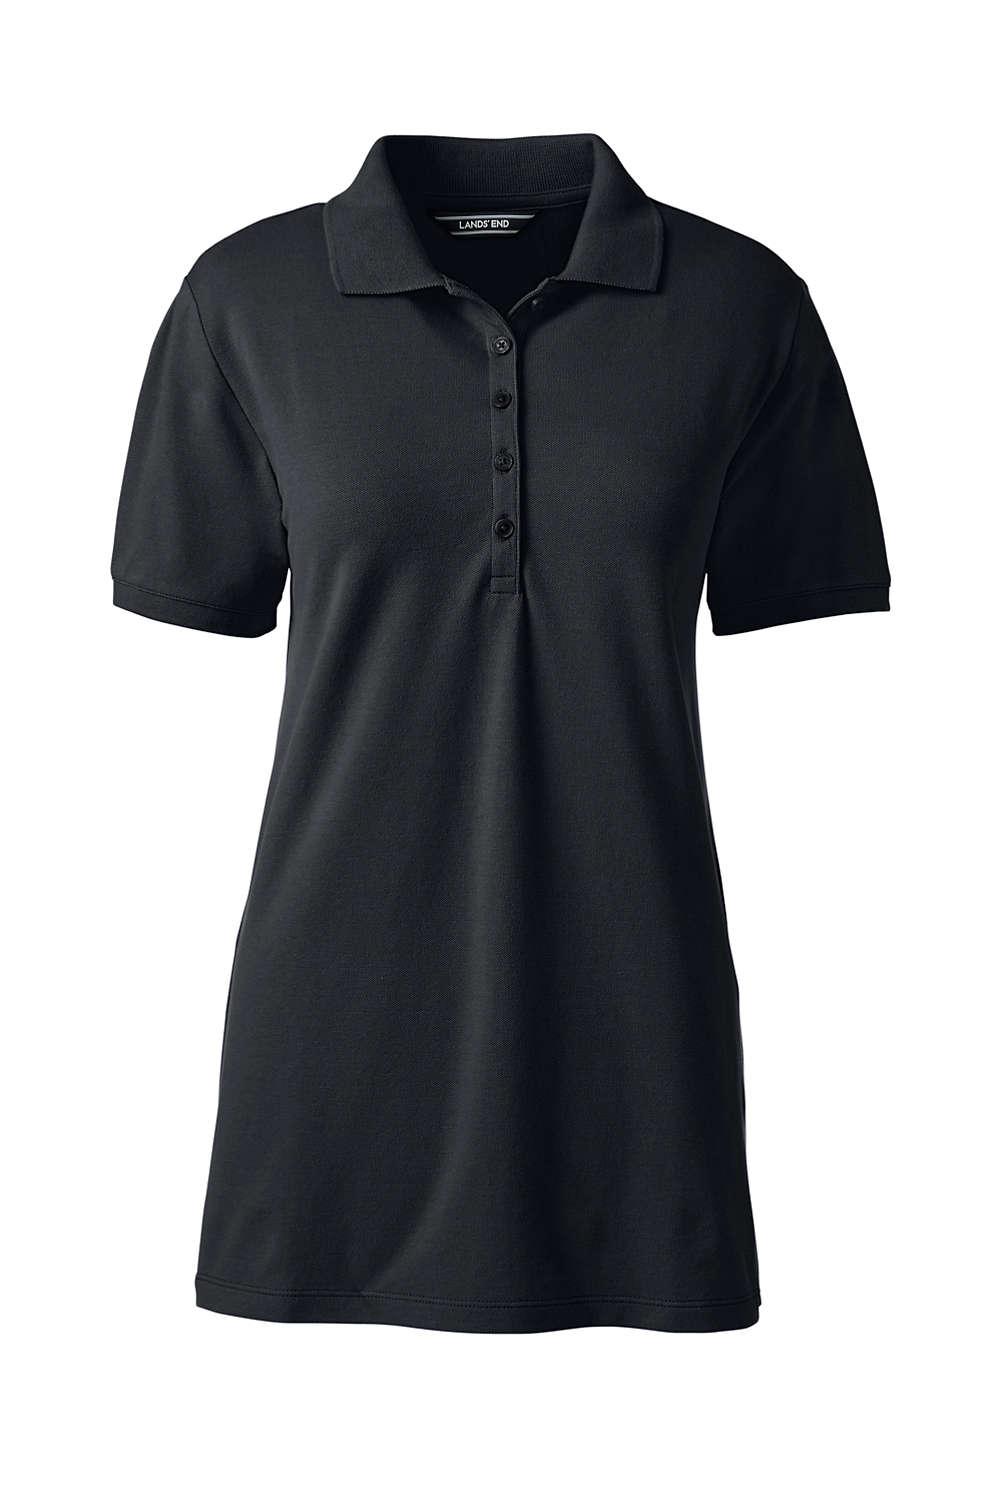 Women s Pique Mesh Polo Shirt from Lands  End 912dfa7136